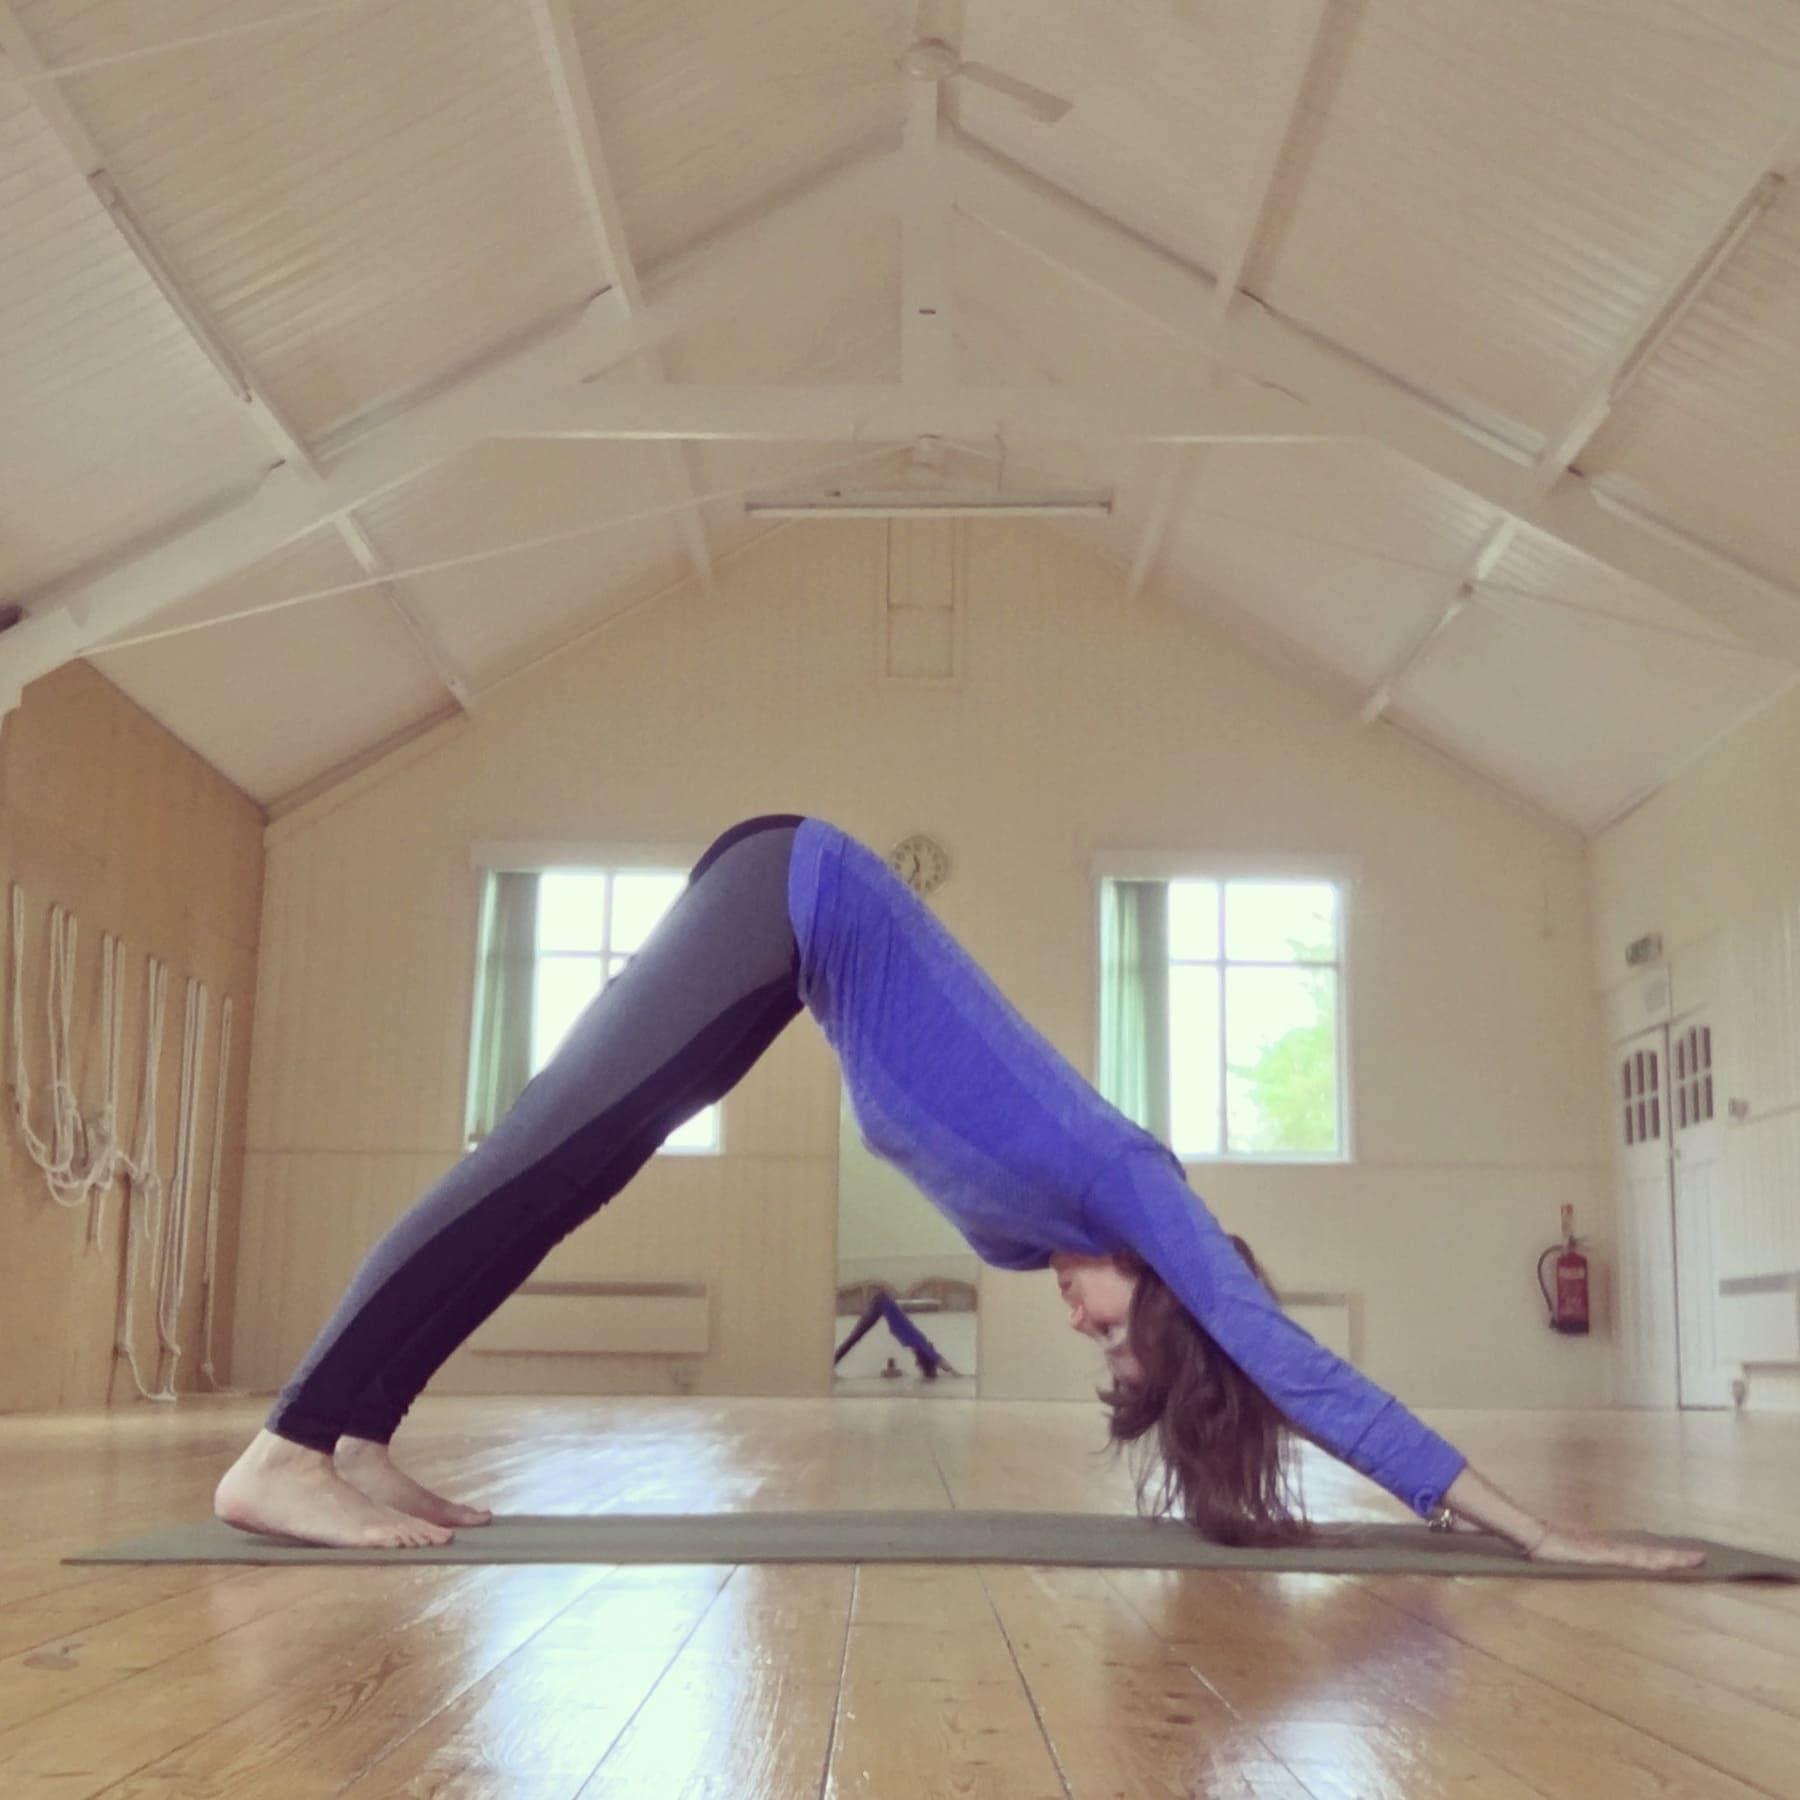 Knutsford Iyengar Yoga Centre